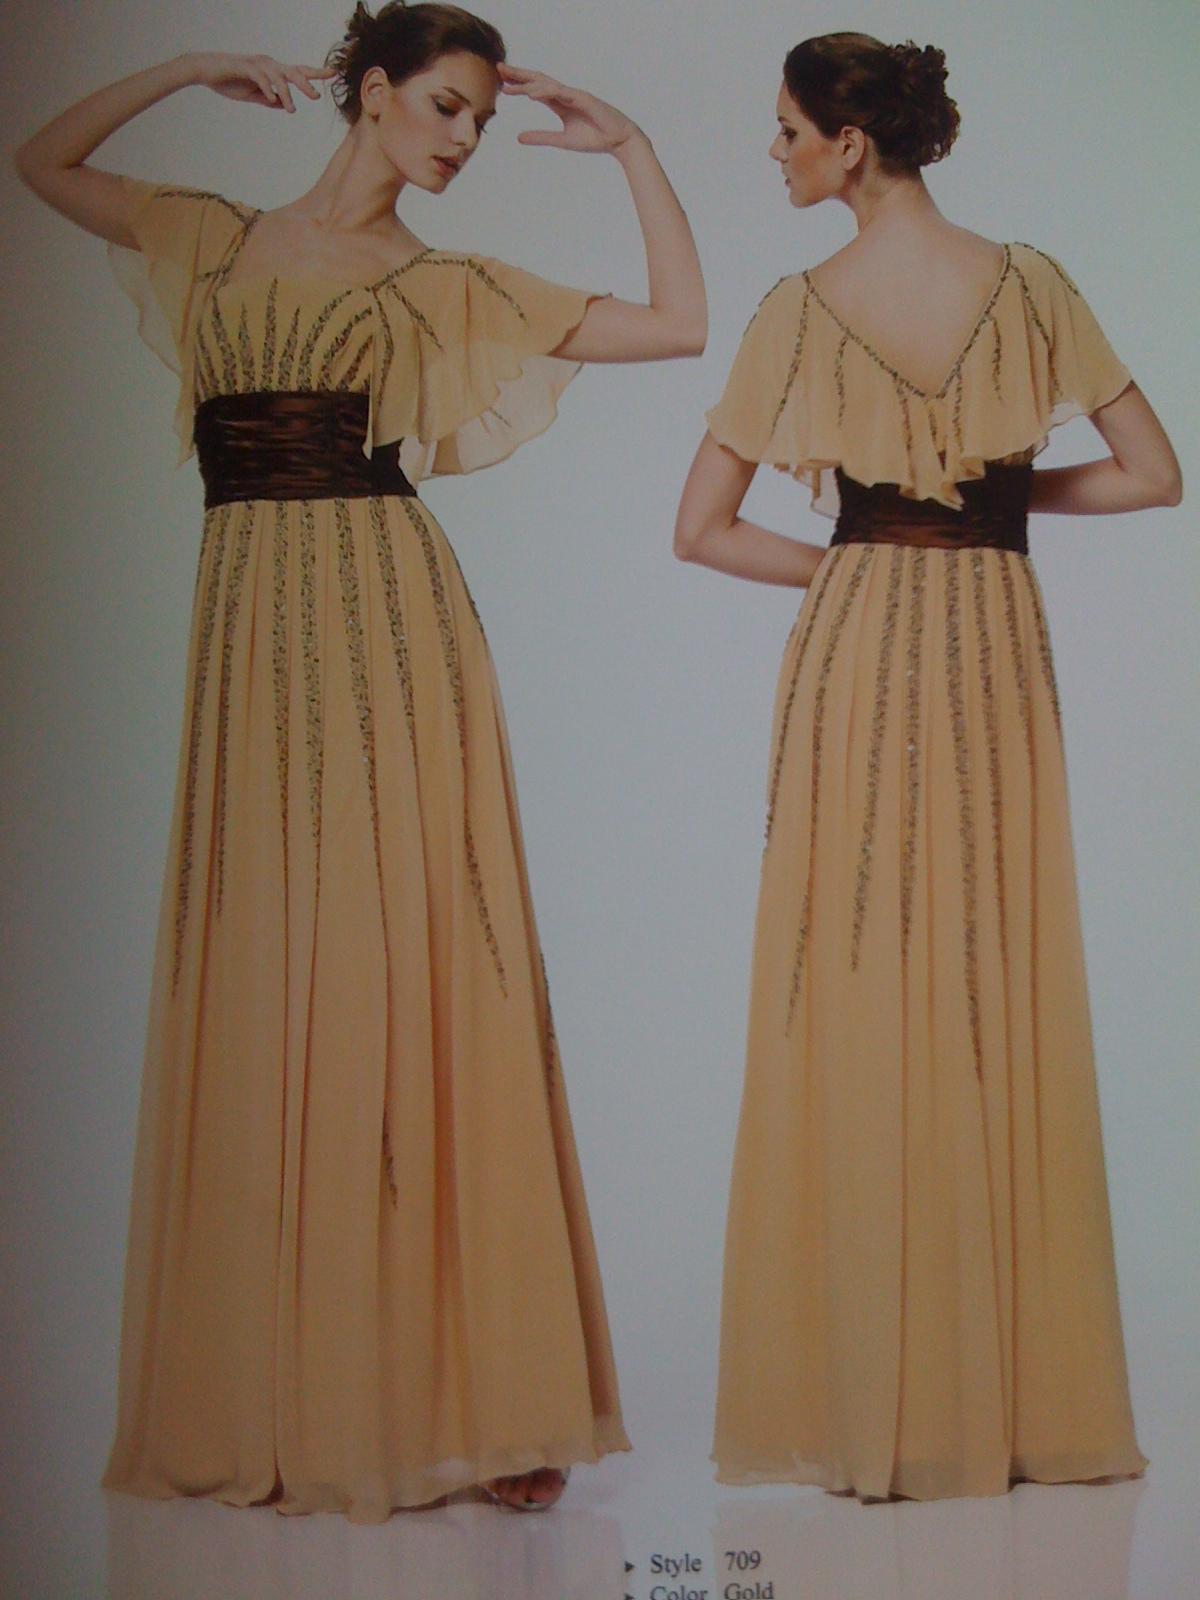 Vestidos para festa de formatura rj